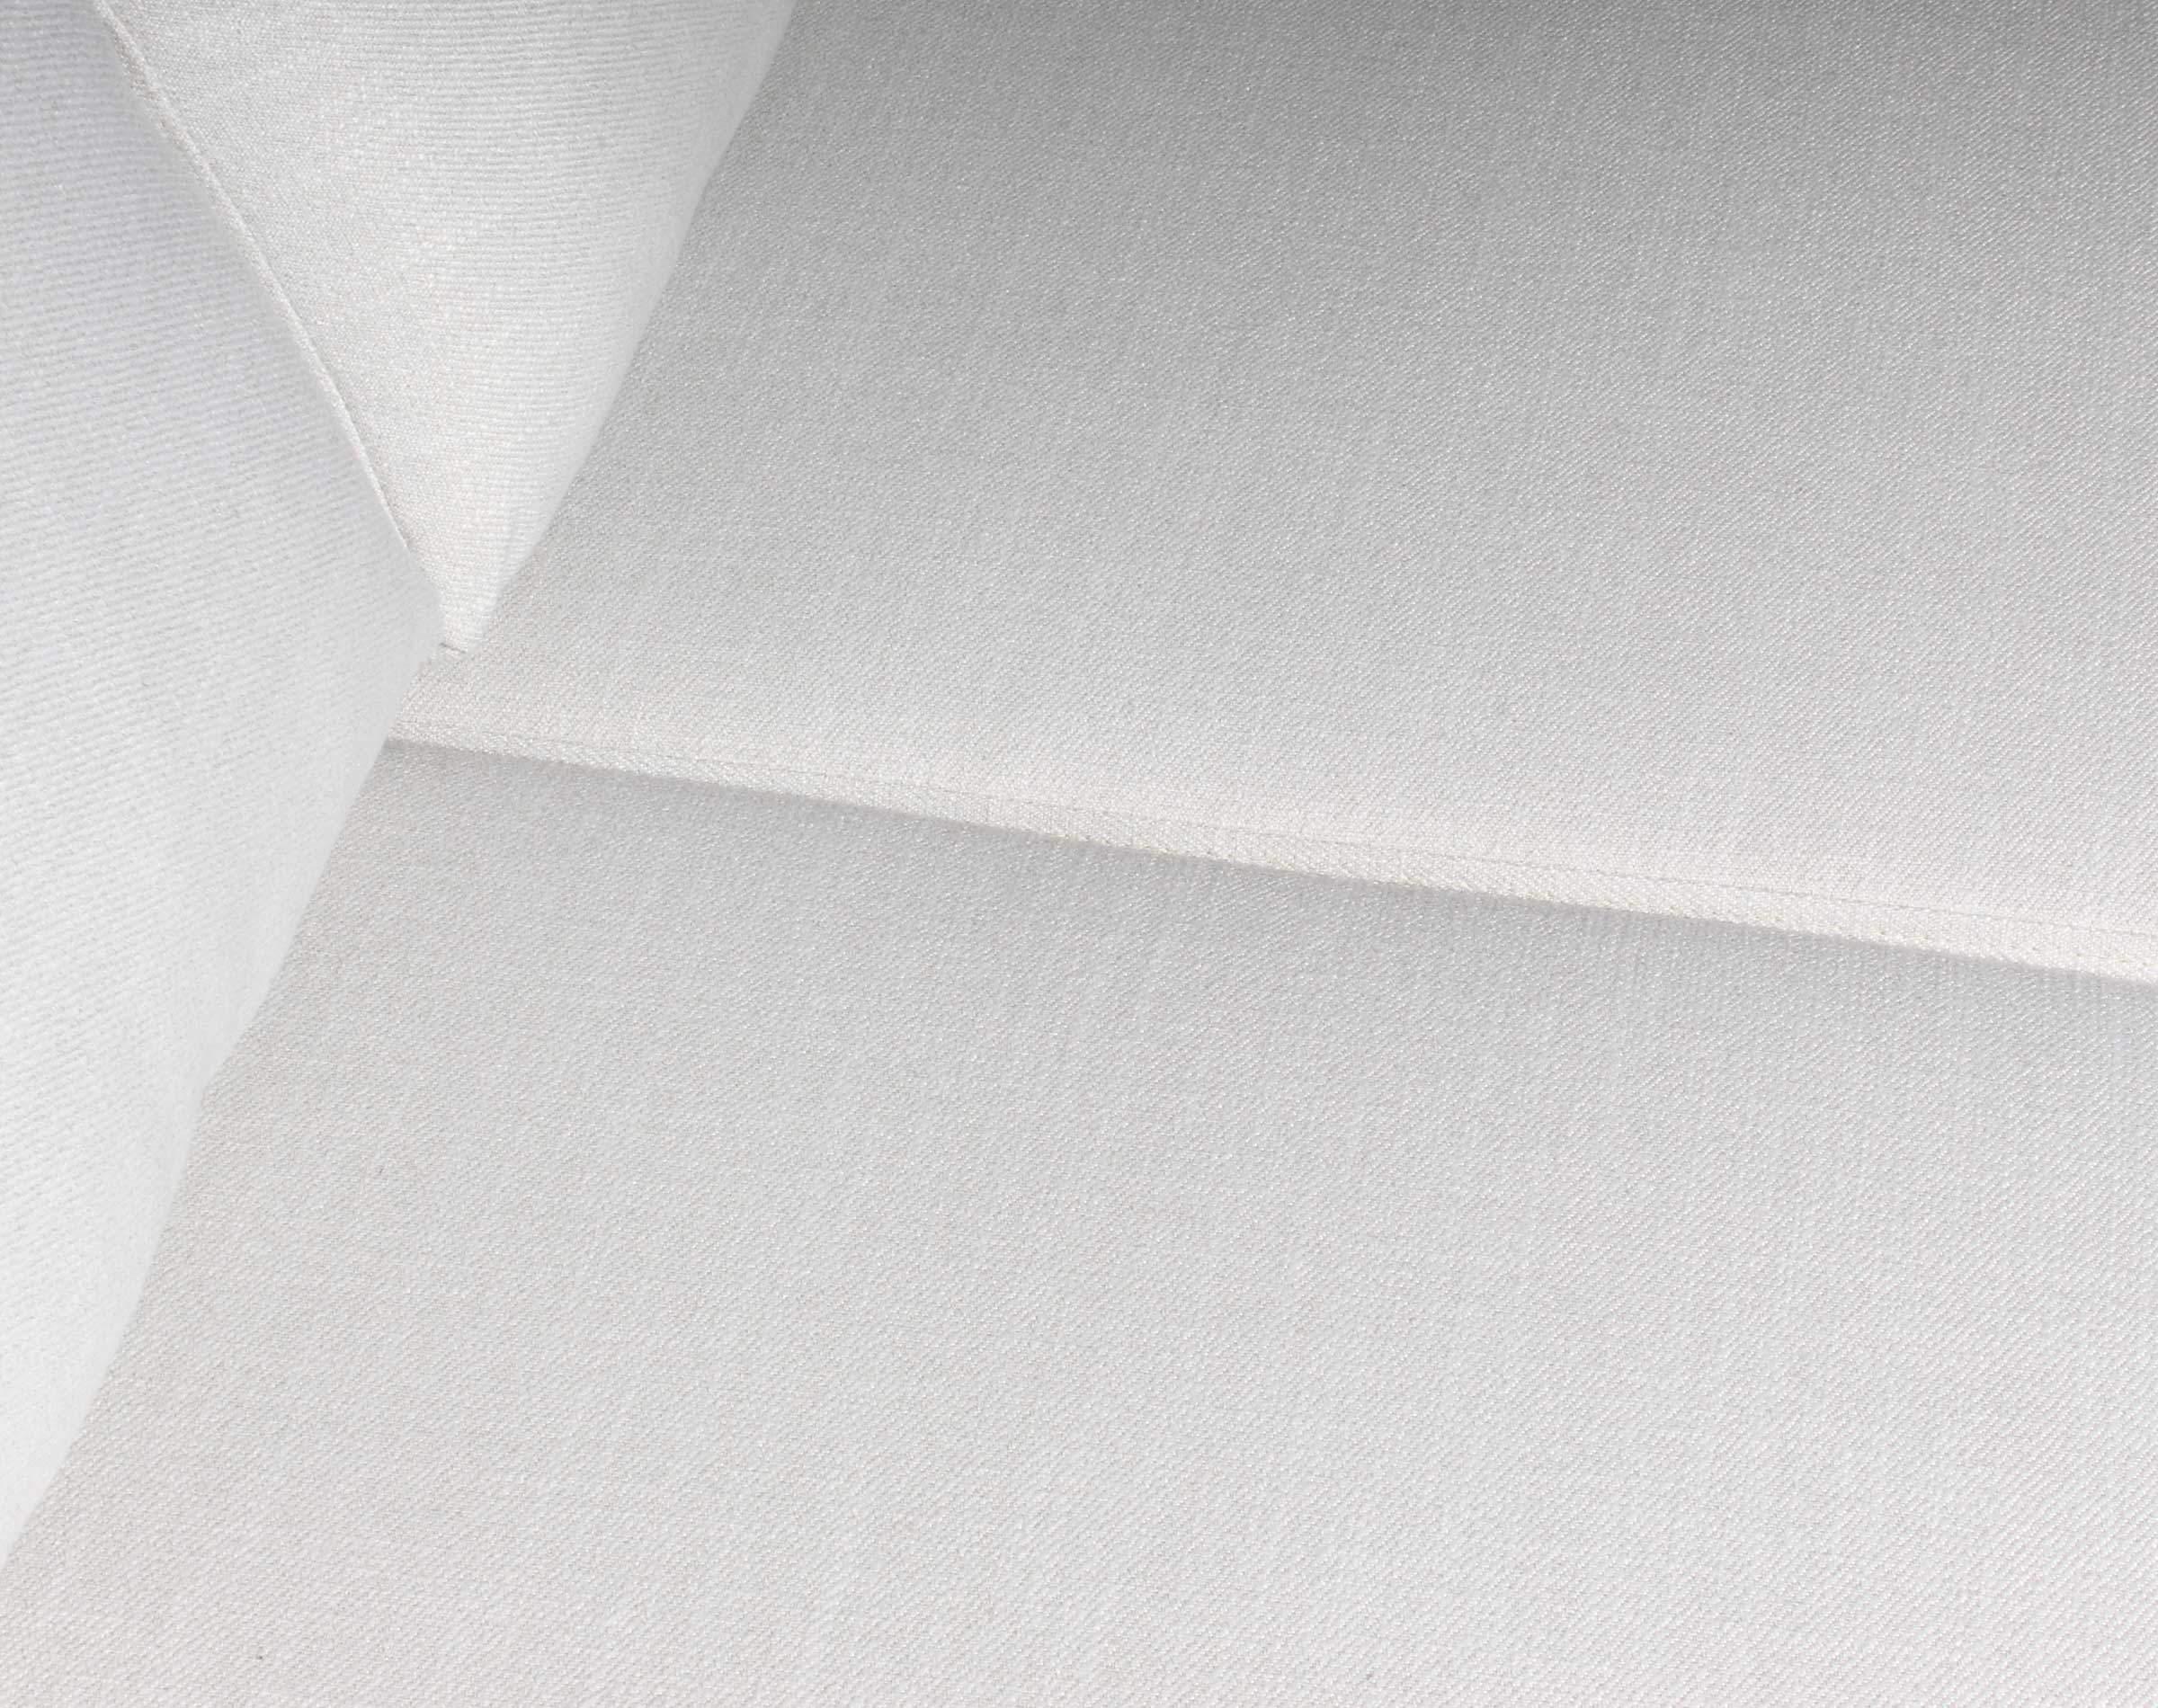 Sofa Seccional Monaco Izquierdo New York Antimanchas Crudo detalle tela